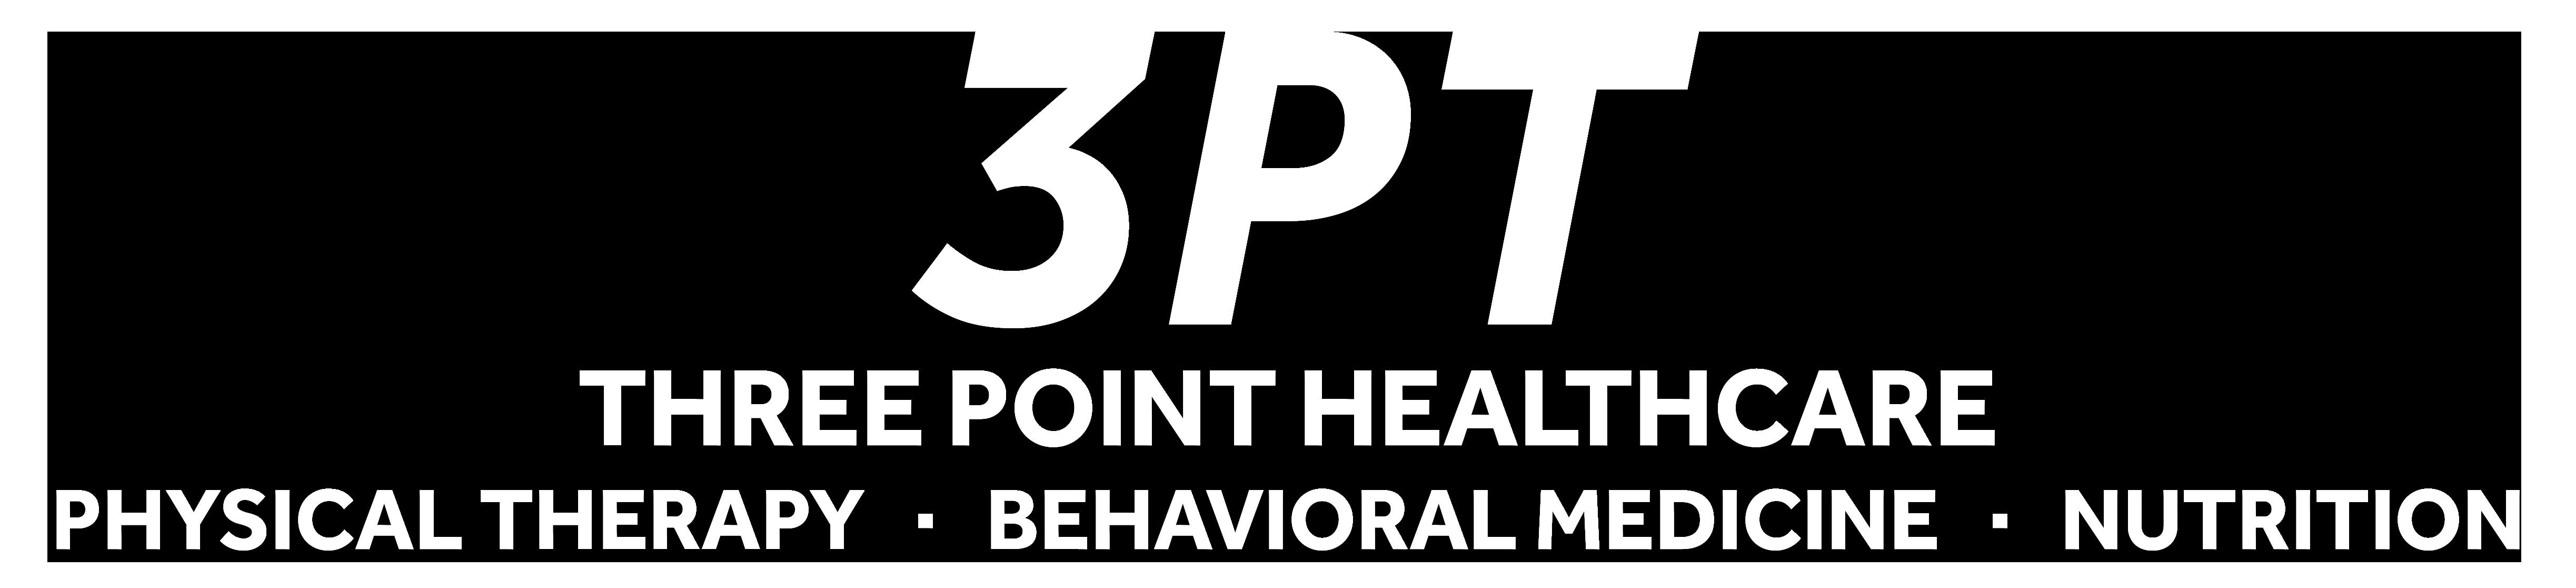 Three Point Healthcare